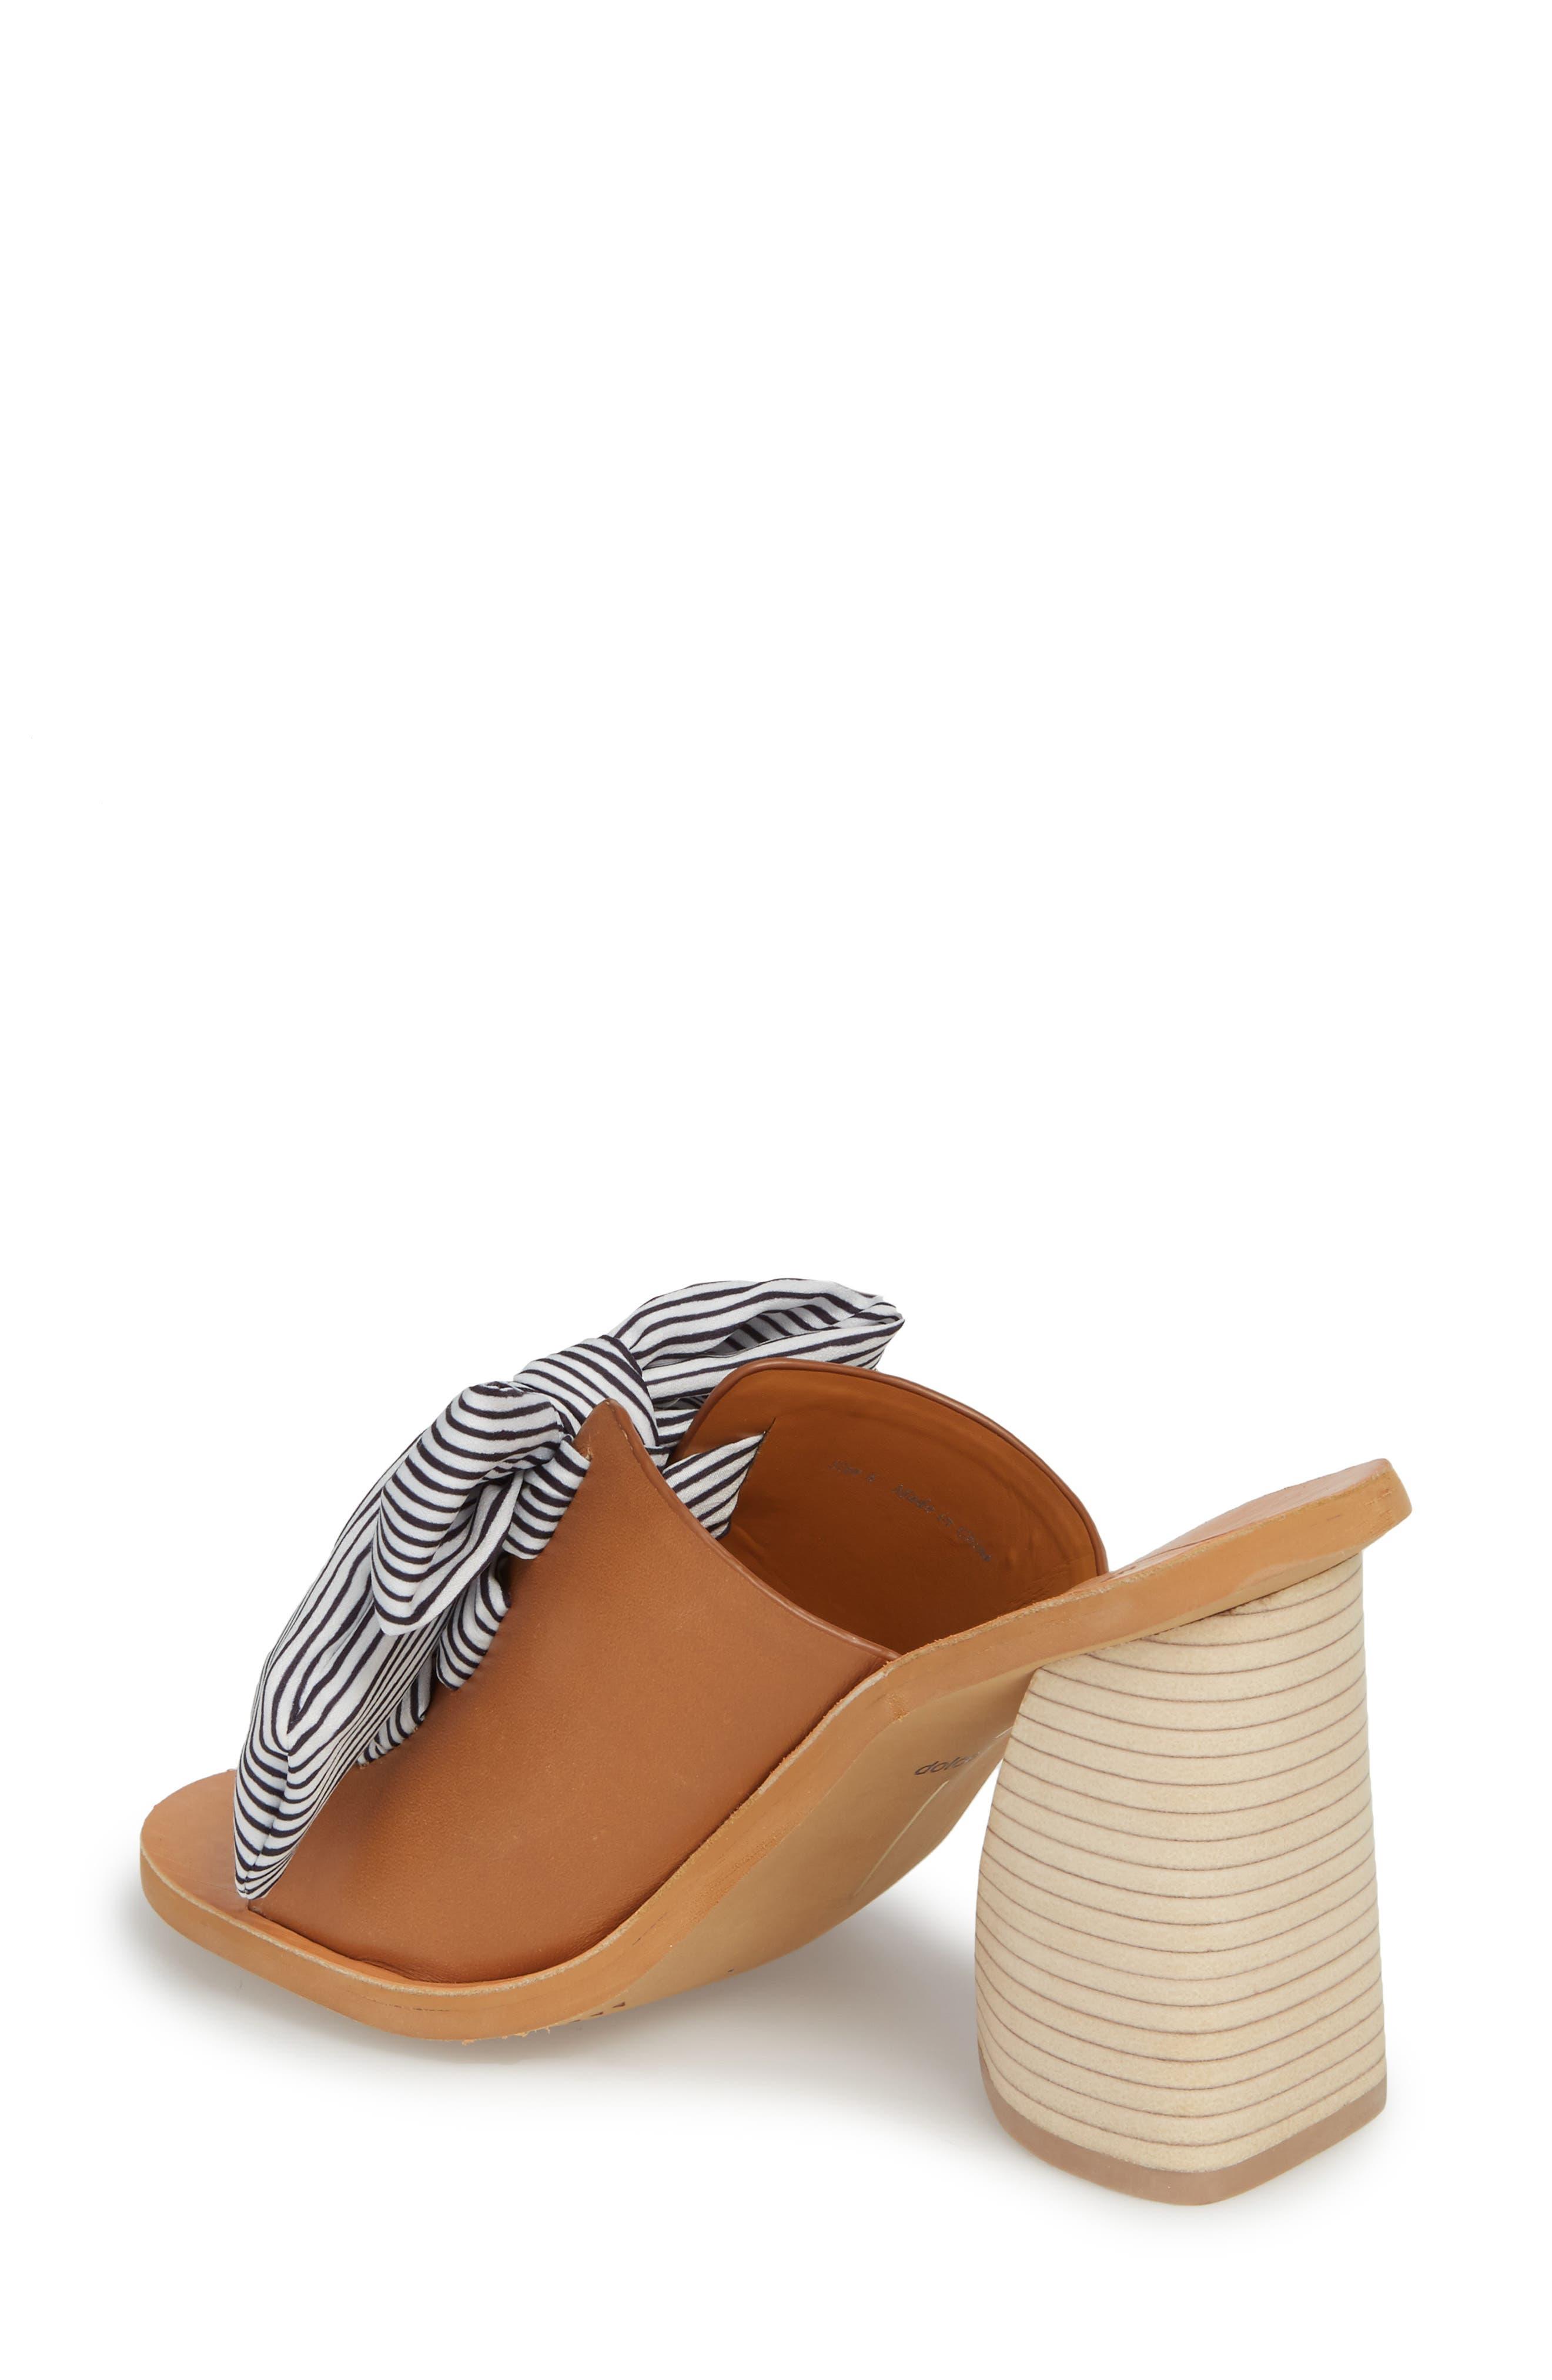 Amber Lace-Up Sandal,                             Alternate thumbnail 2, color,                             Caramel Leather